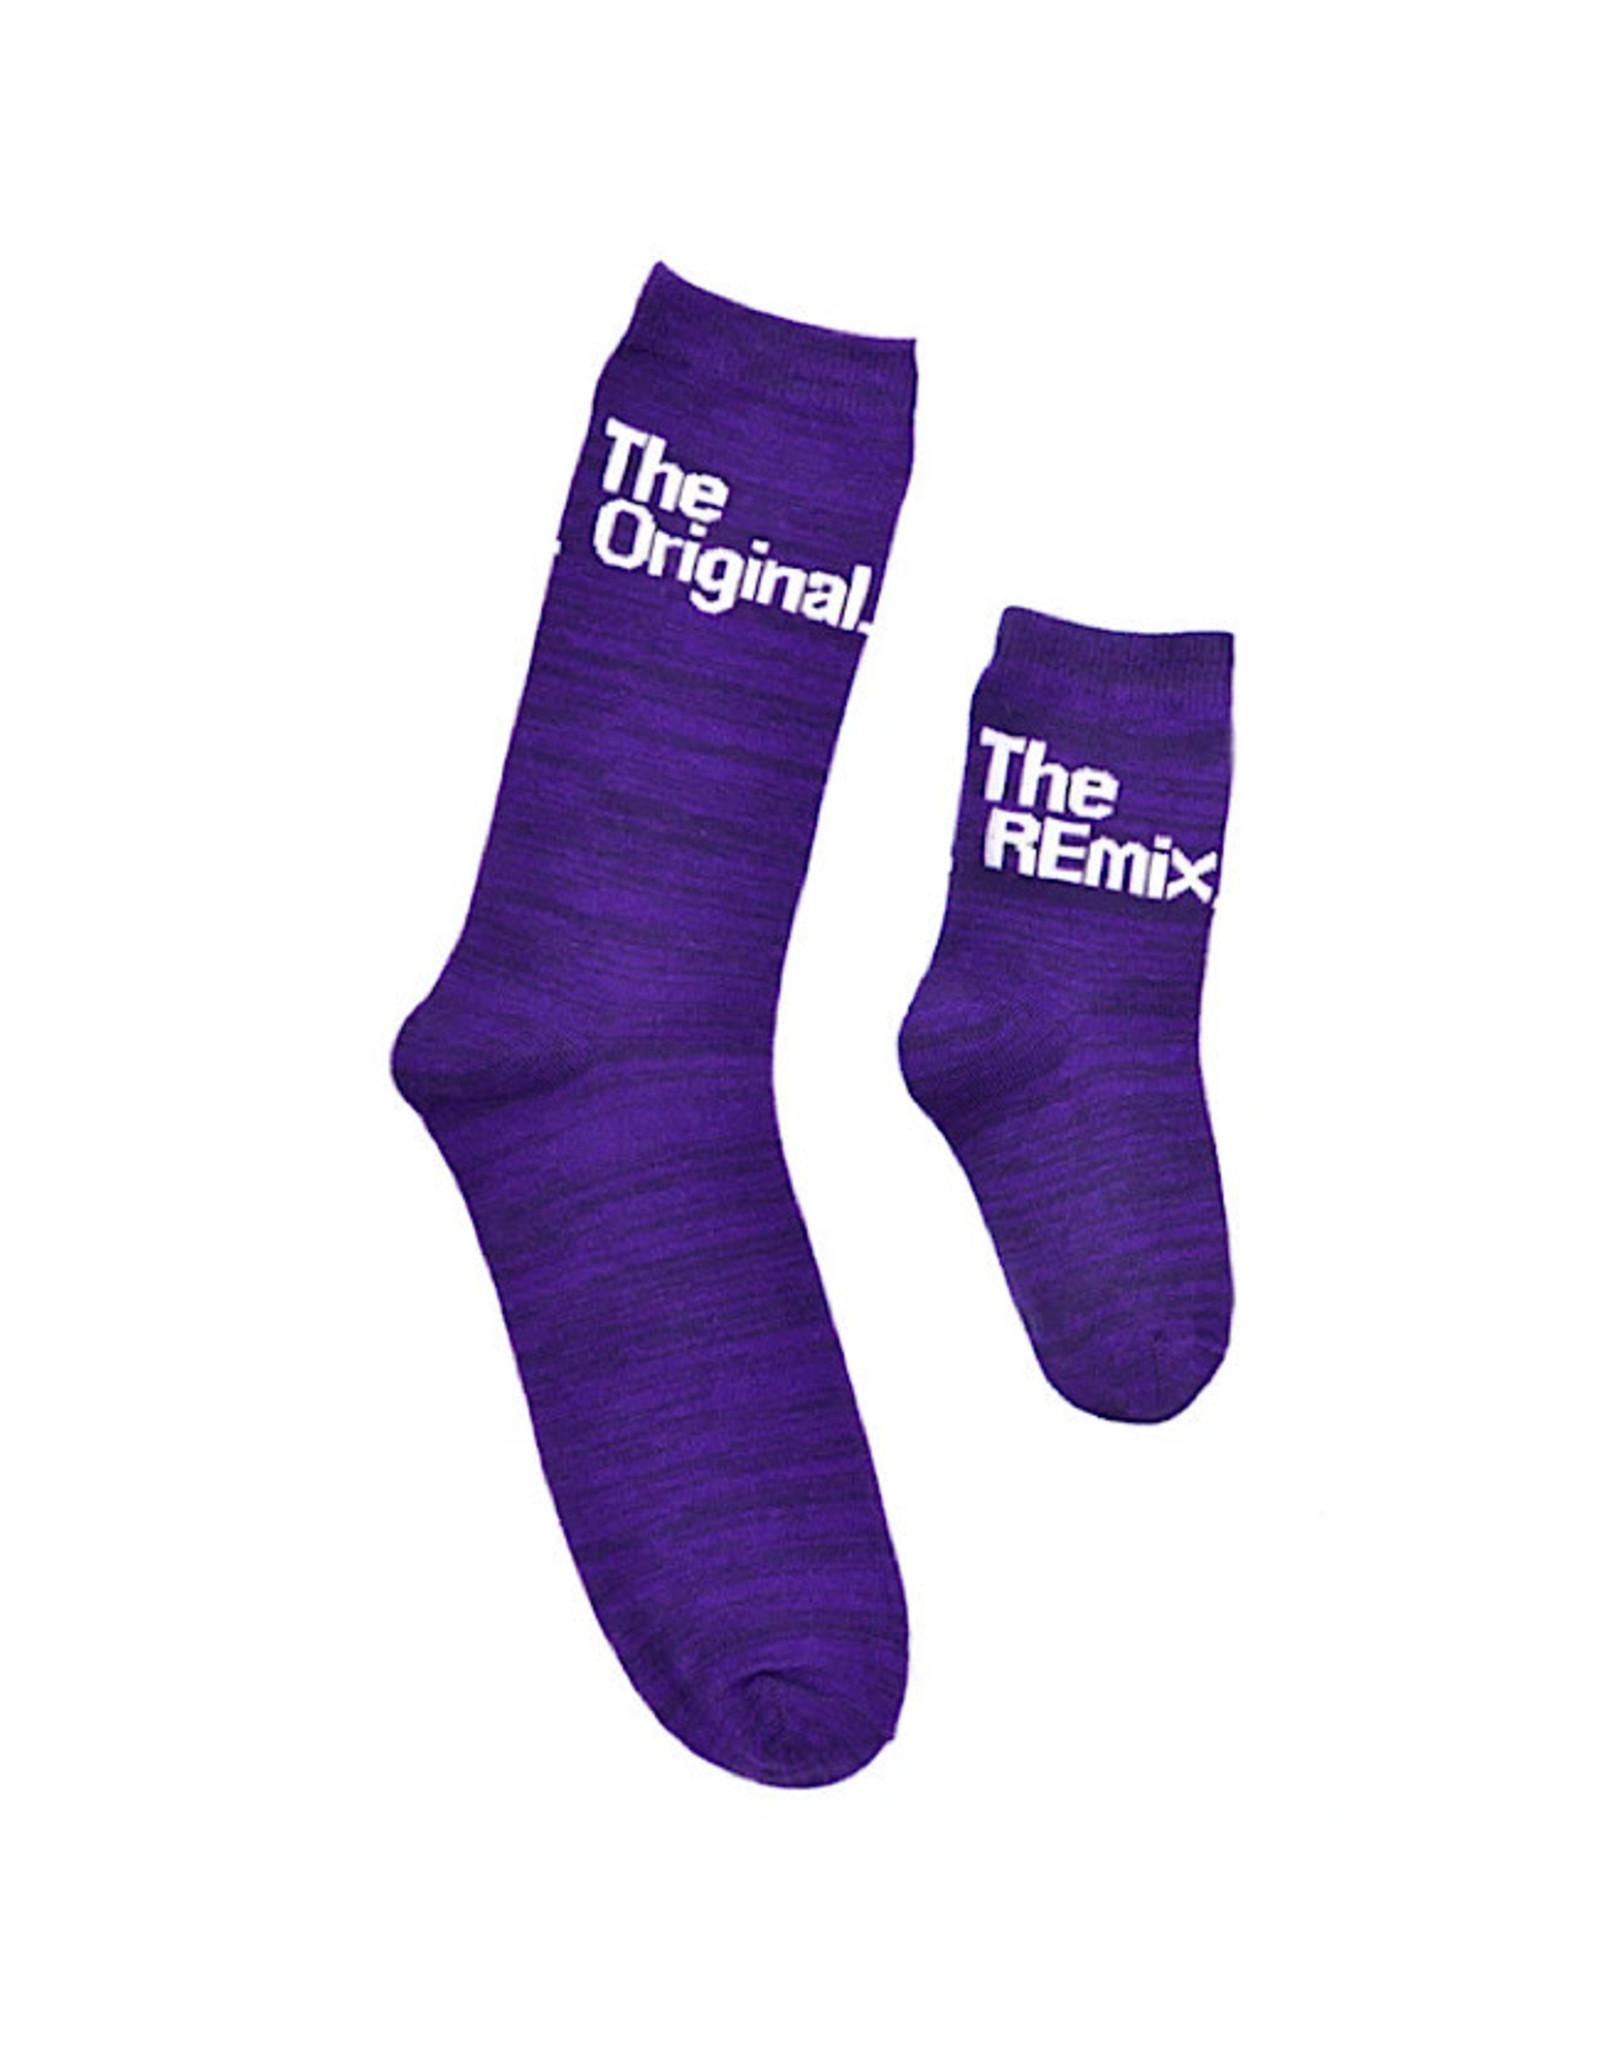 Socks (2 Pack) (Mens & Kids) - The Original, The Remix